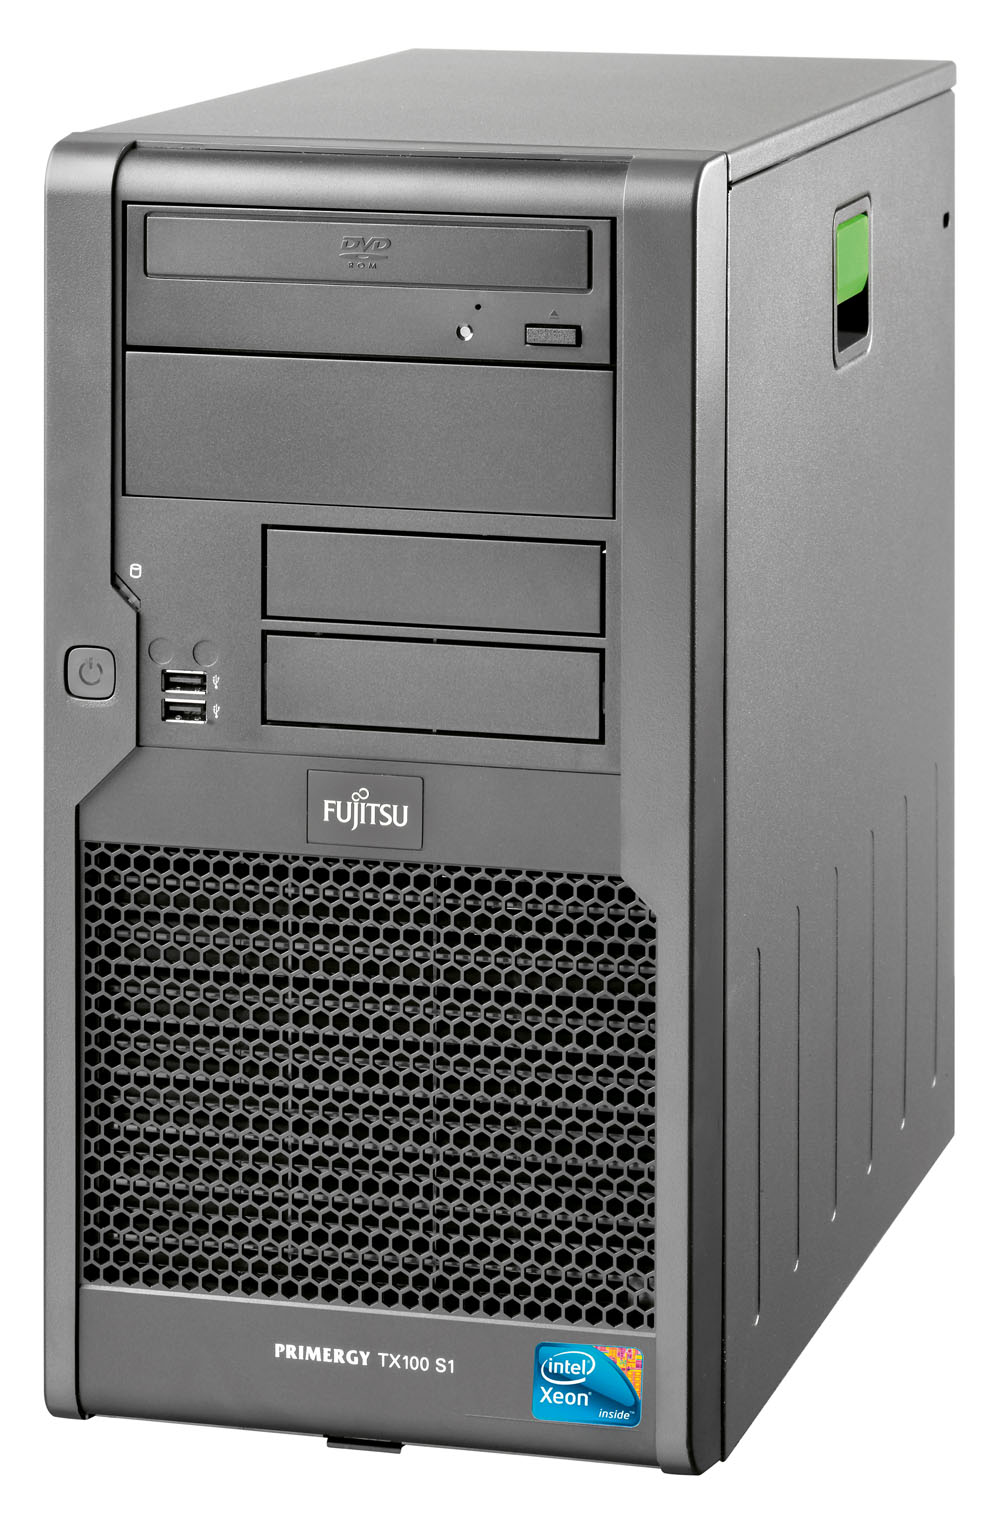 Сервер Fujitsu PRIMERGY TX100S1 x3220 NHP SATA (Tower XeonQC2.4GHz(8Mb), 2x2GB, 2x500GB nhp SATA(up to 4), RAID 0,1, DVDRW, GigEth, noTPM, noPwrCord)